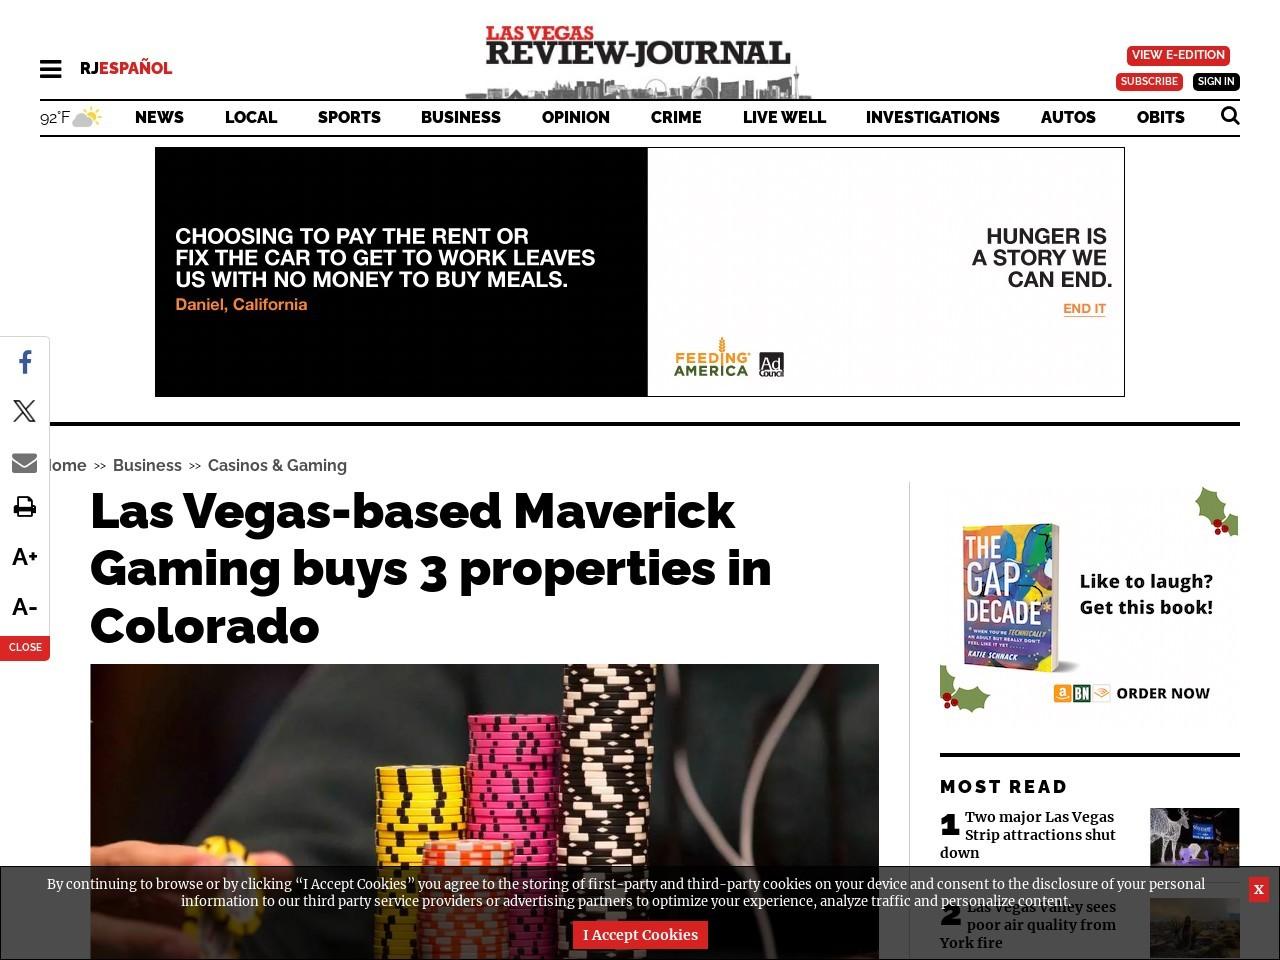 Las Vegas-based Maverick Gaming buys 3 properties in Colorado